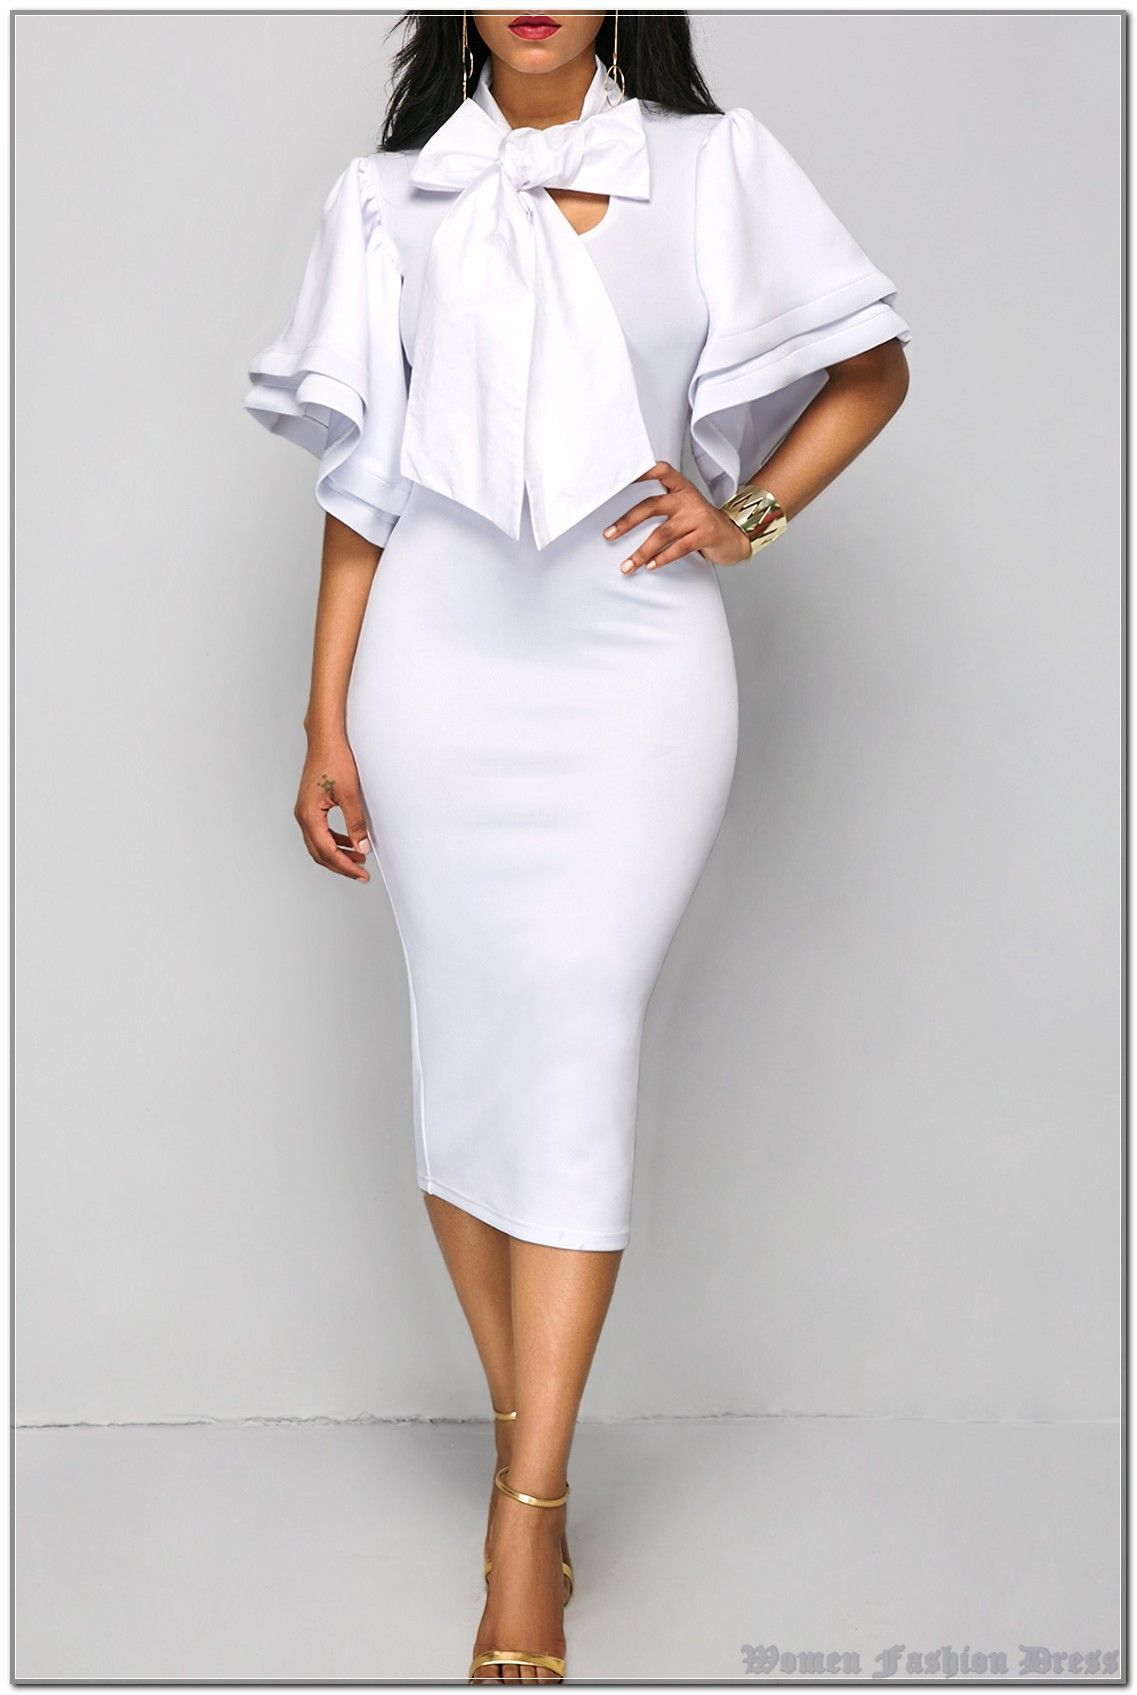 Women Fashion Dress For Money